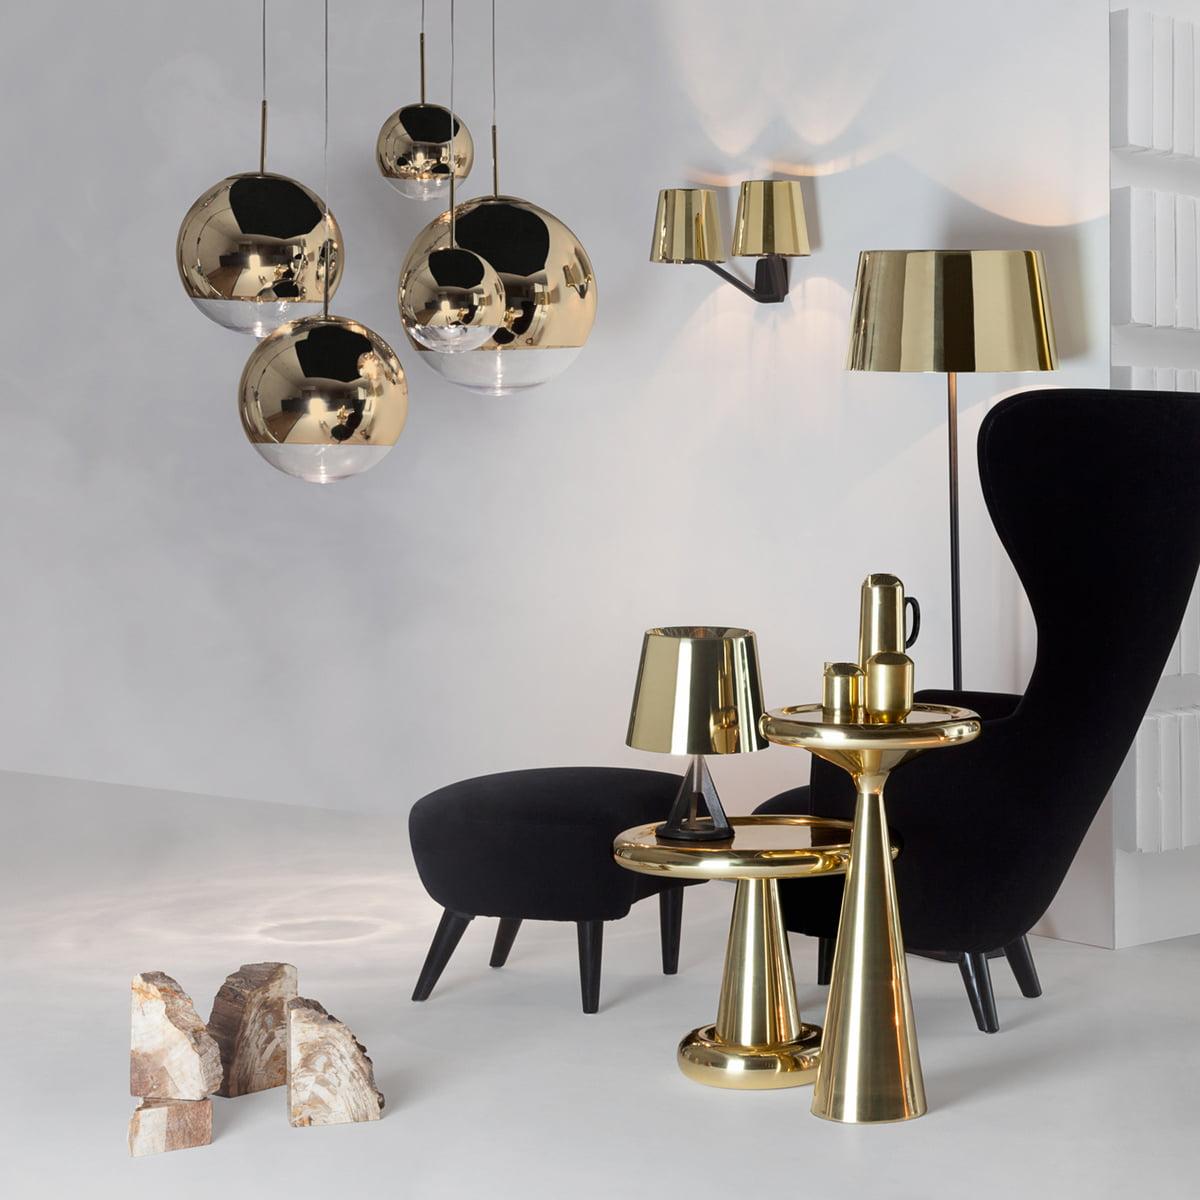 Mirror ball gold pendant light by tom dixon tom dixon mirror ball gold pendant lamp arubaitofo Gallery